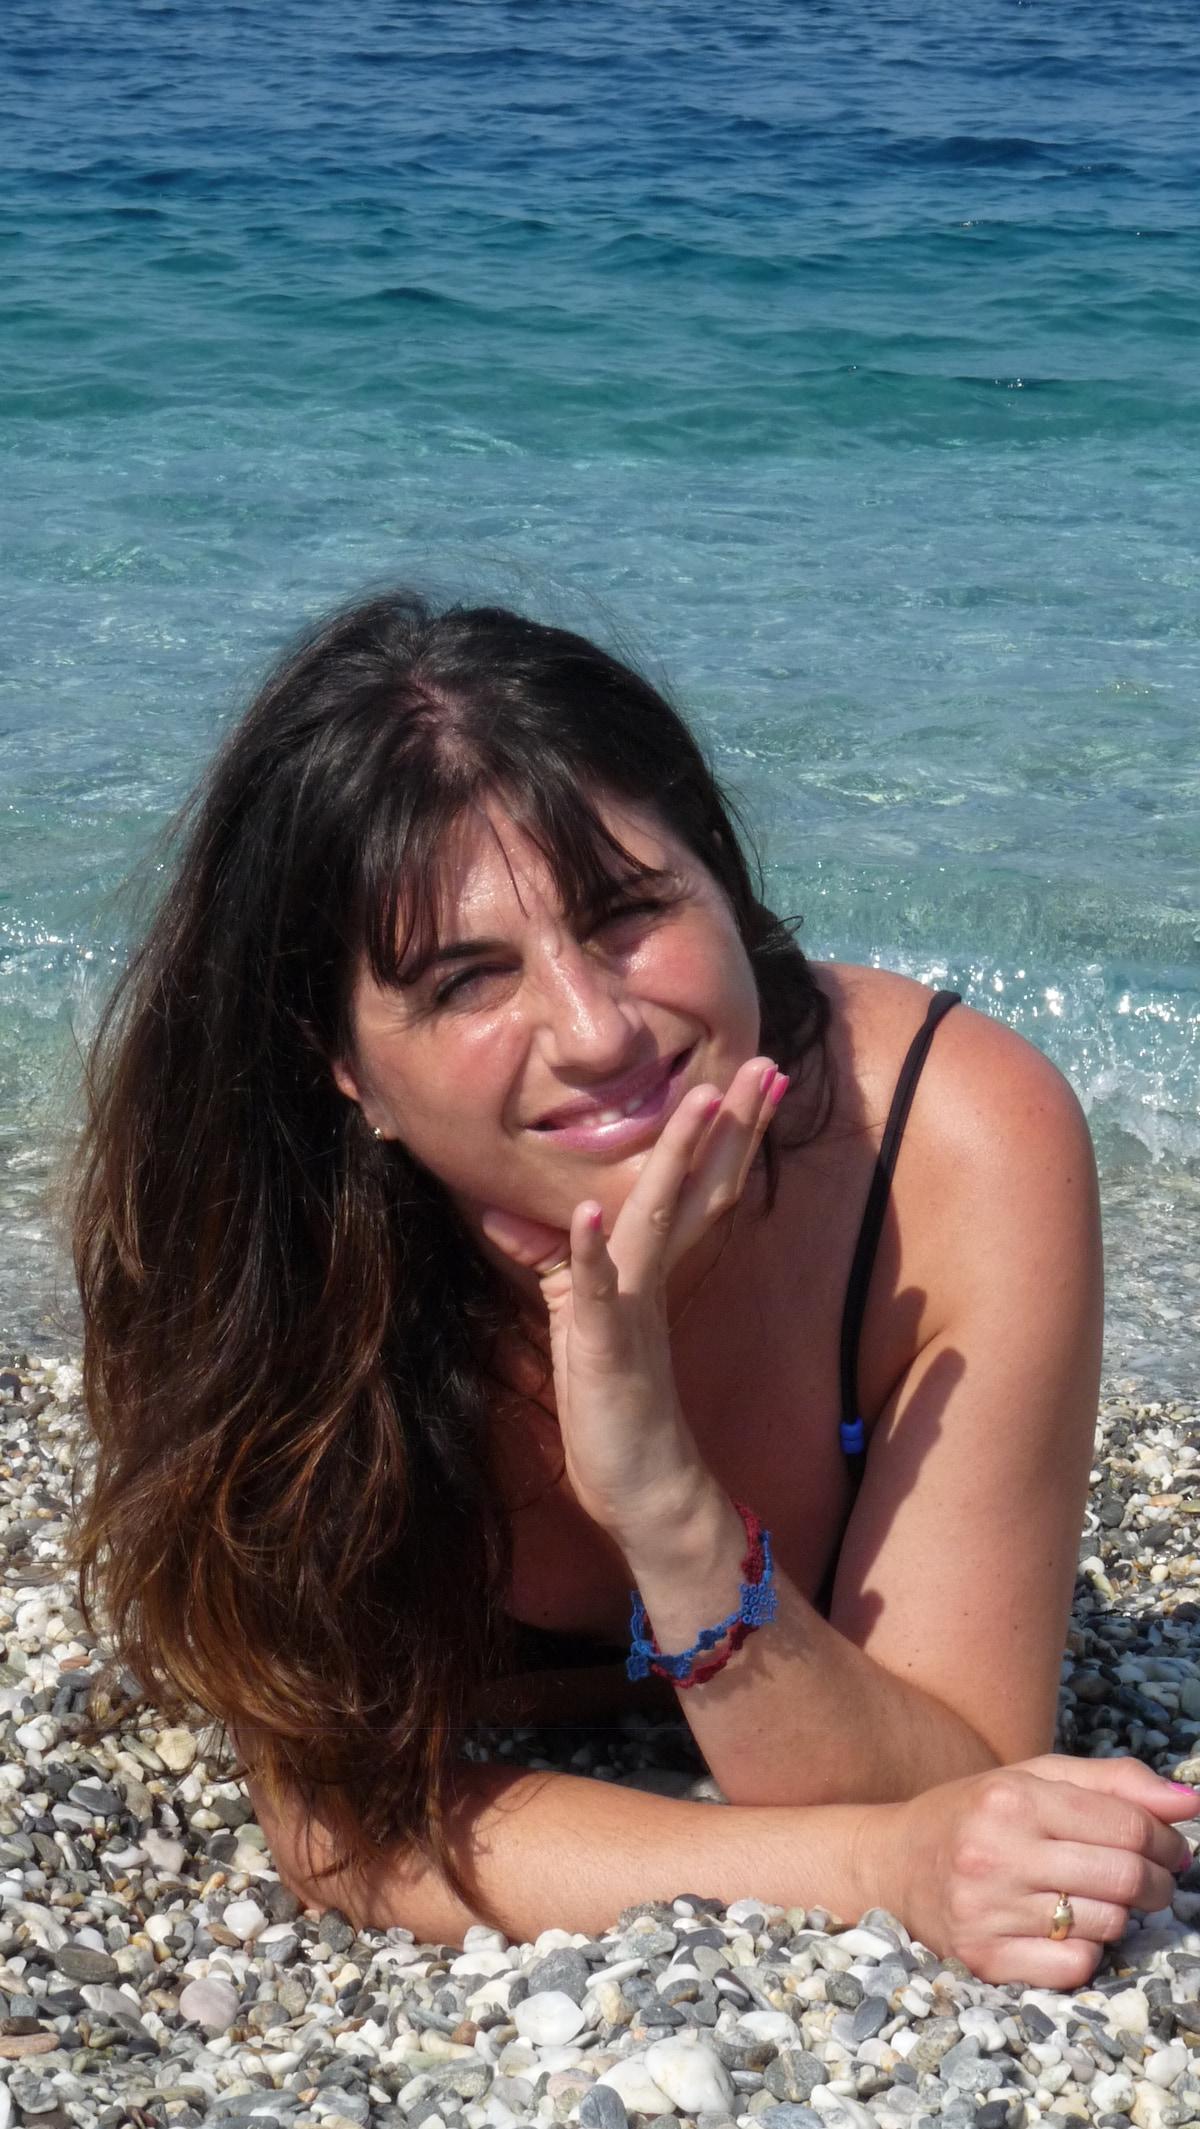 Stefania from Buonconvento